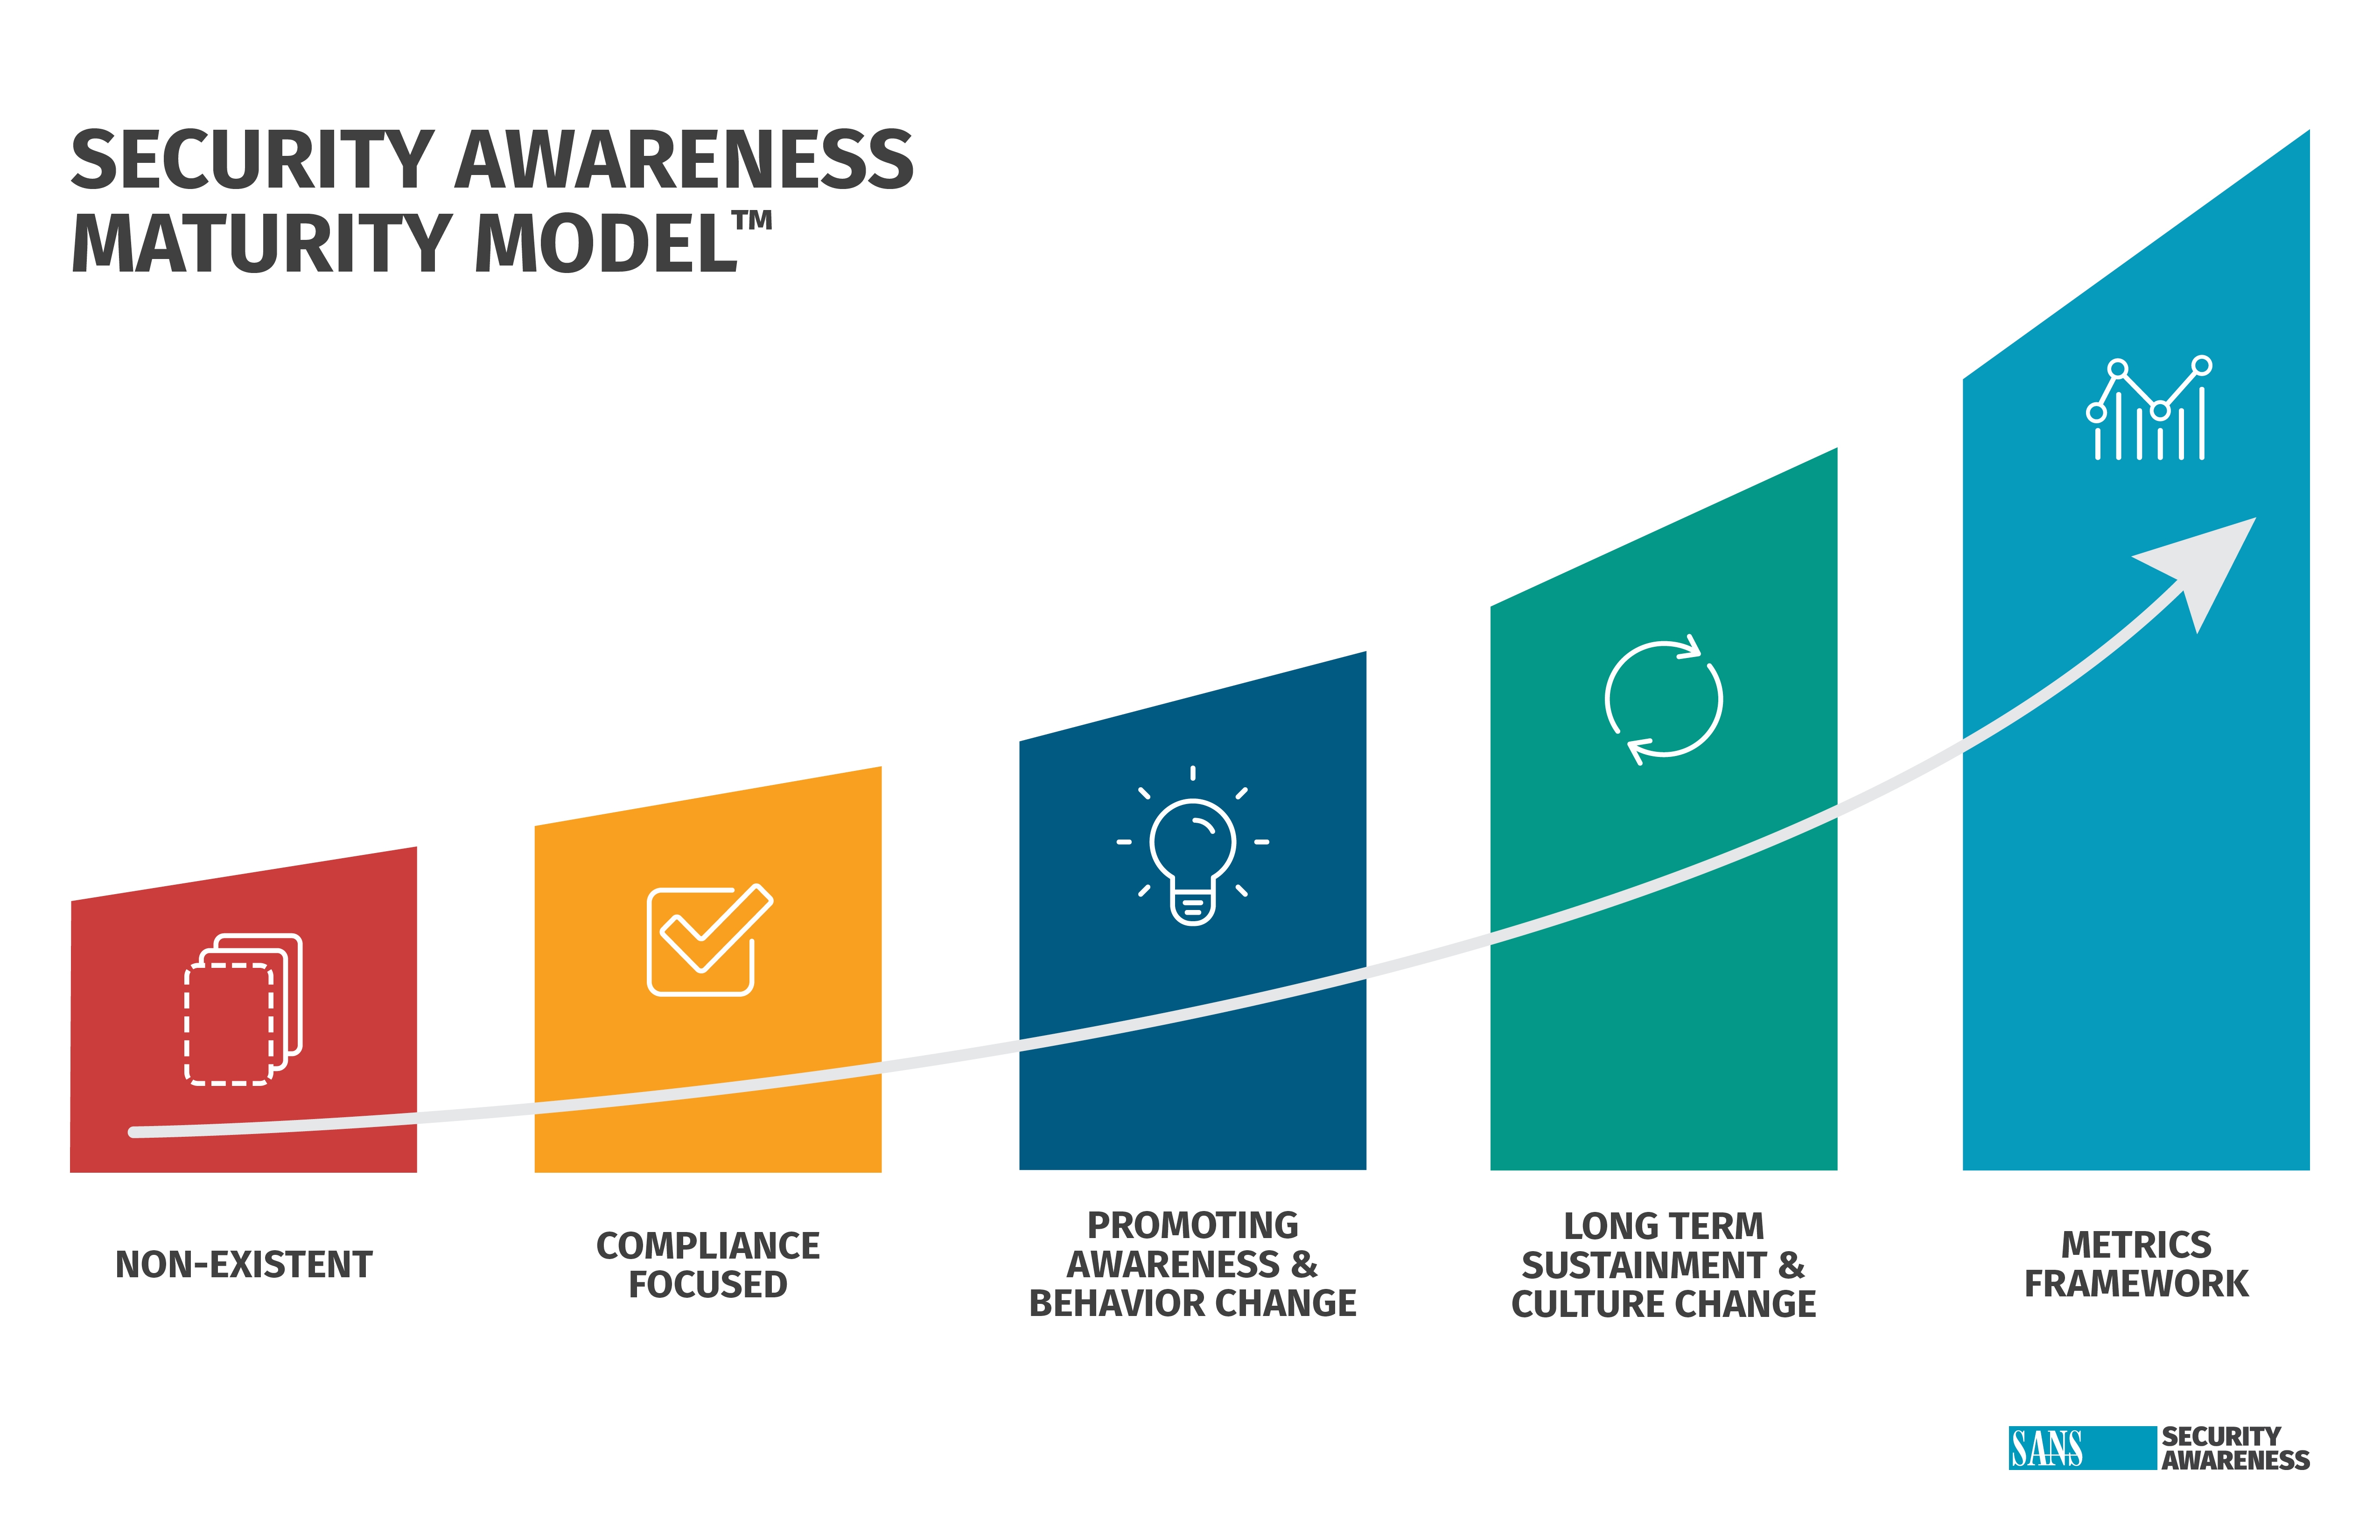 SSA_Maturity_Model_Infographic_Final_tm.jpg